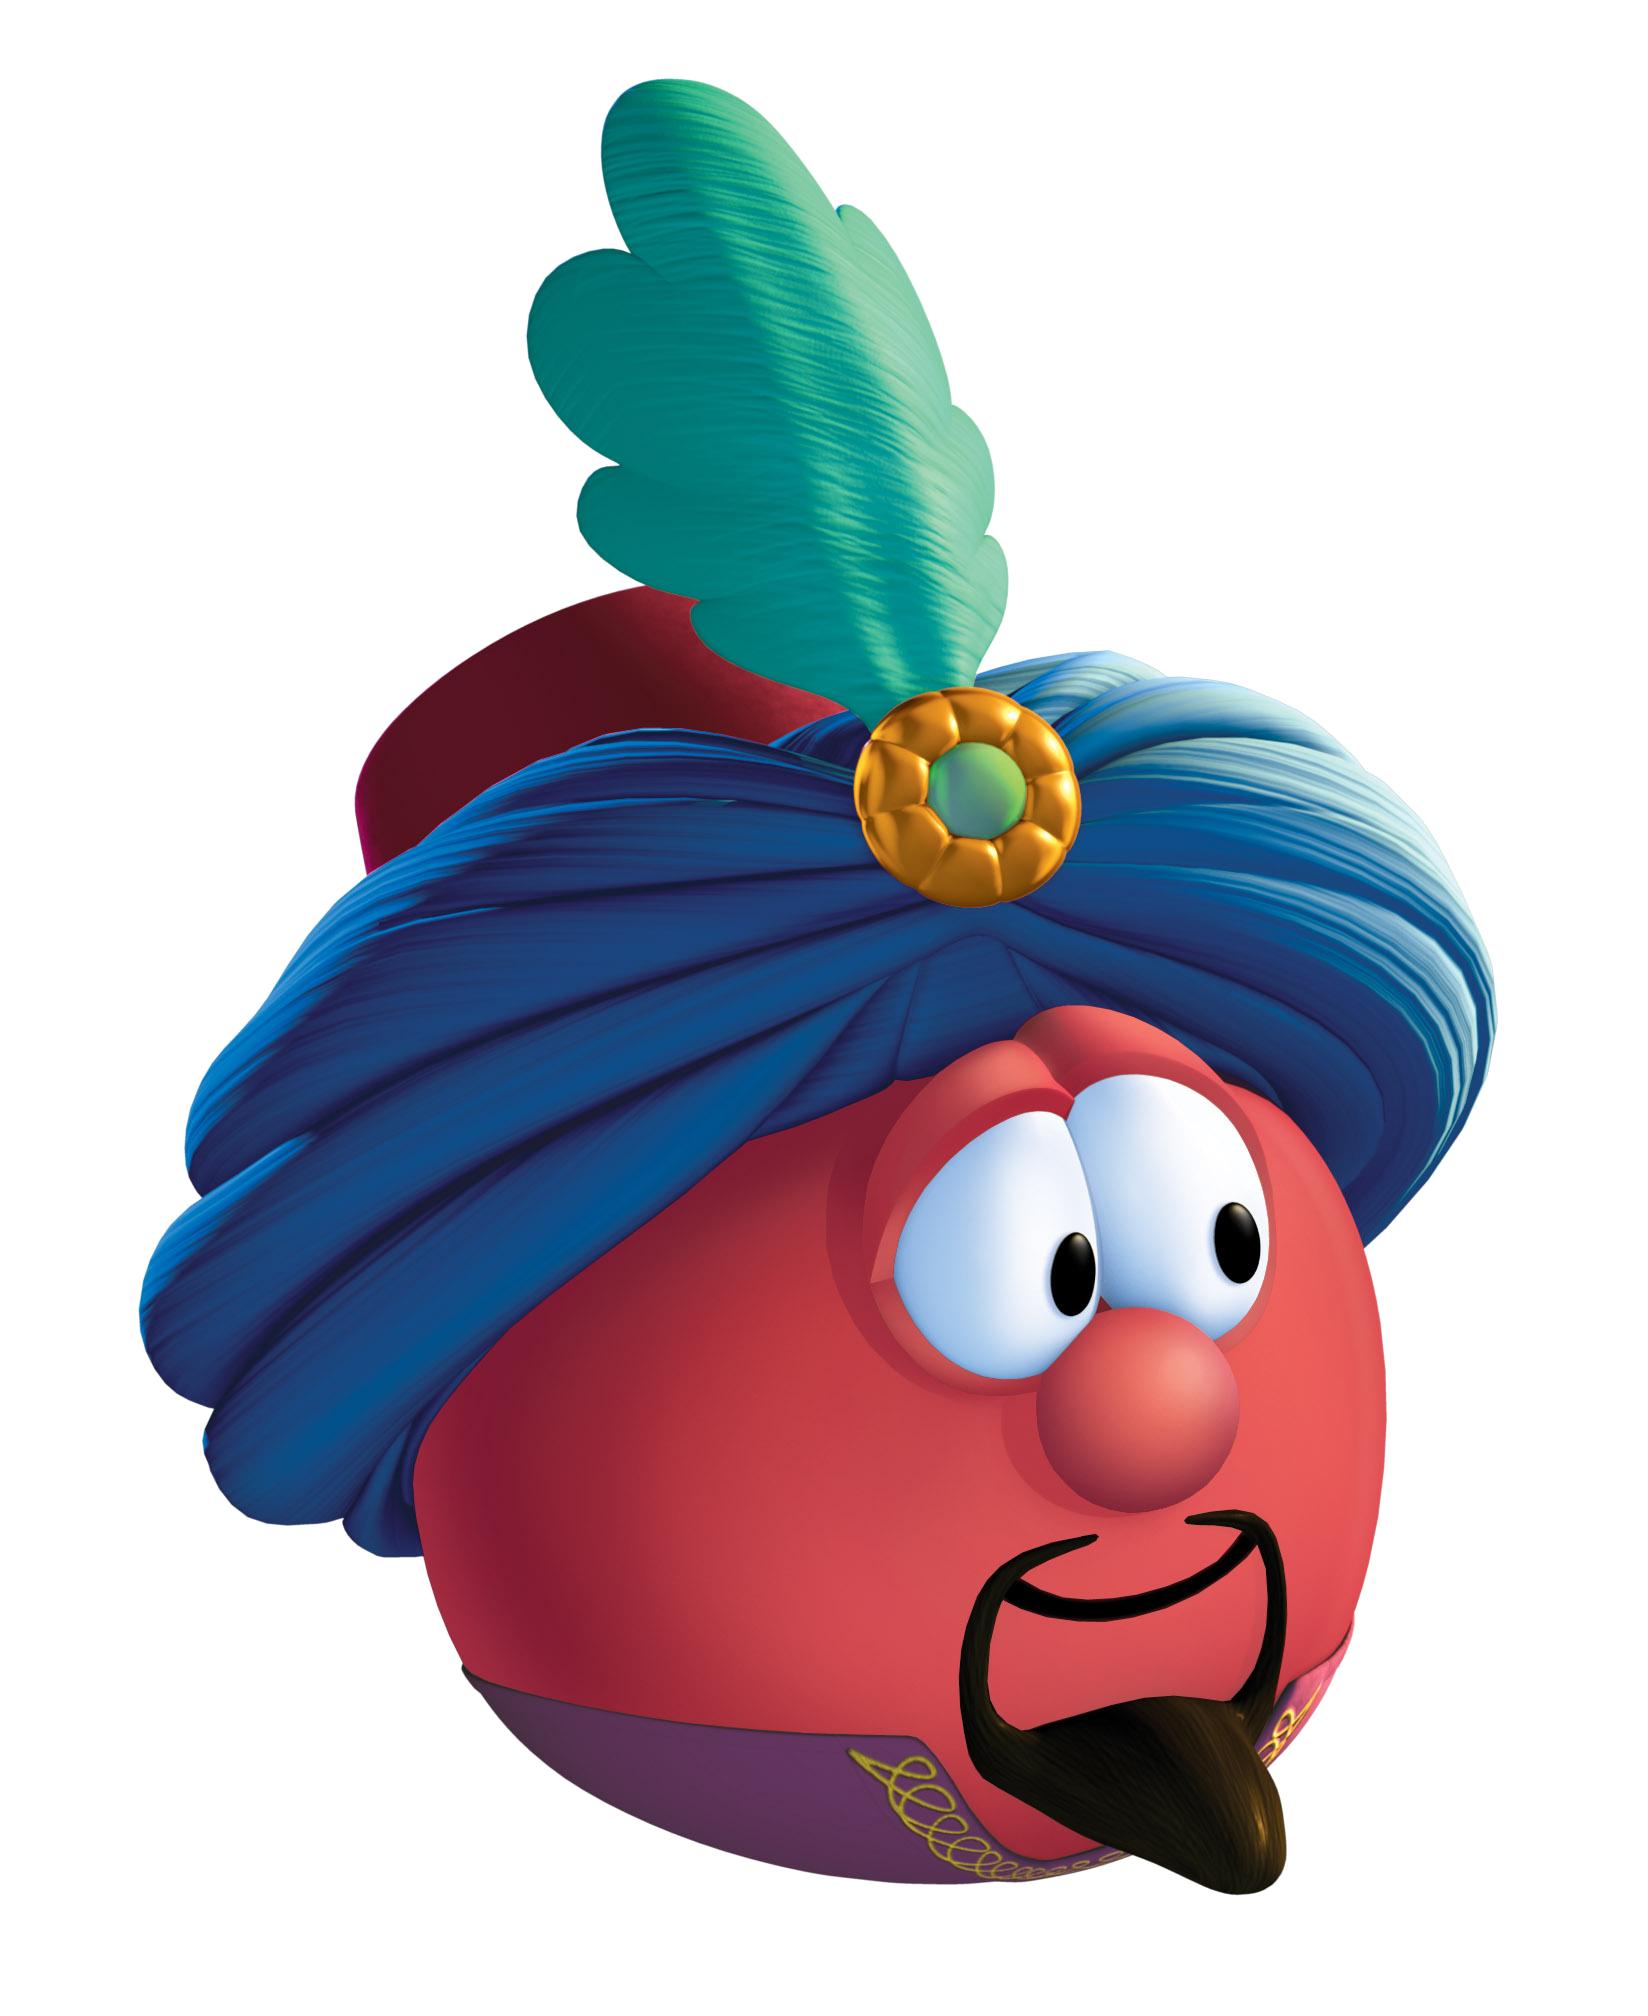 Tomatoes clipart bob. Melchior veggietales it s